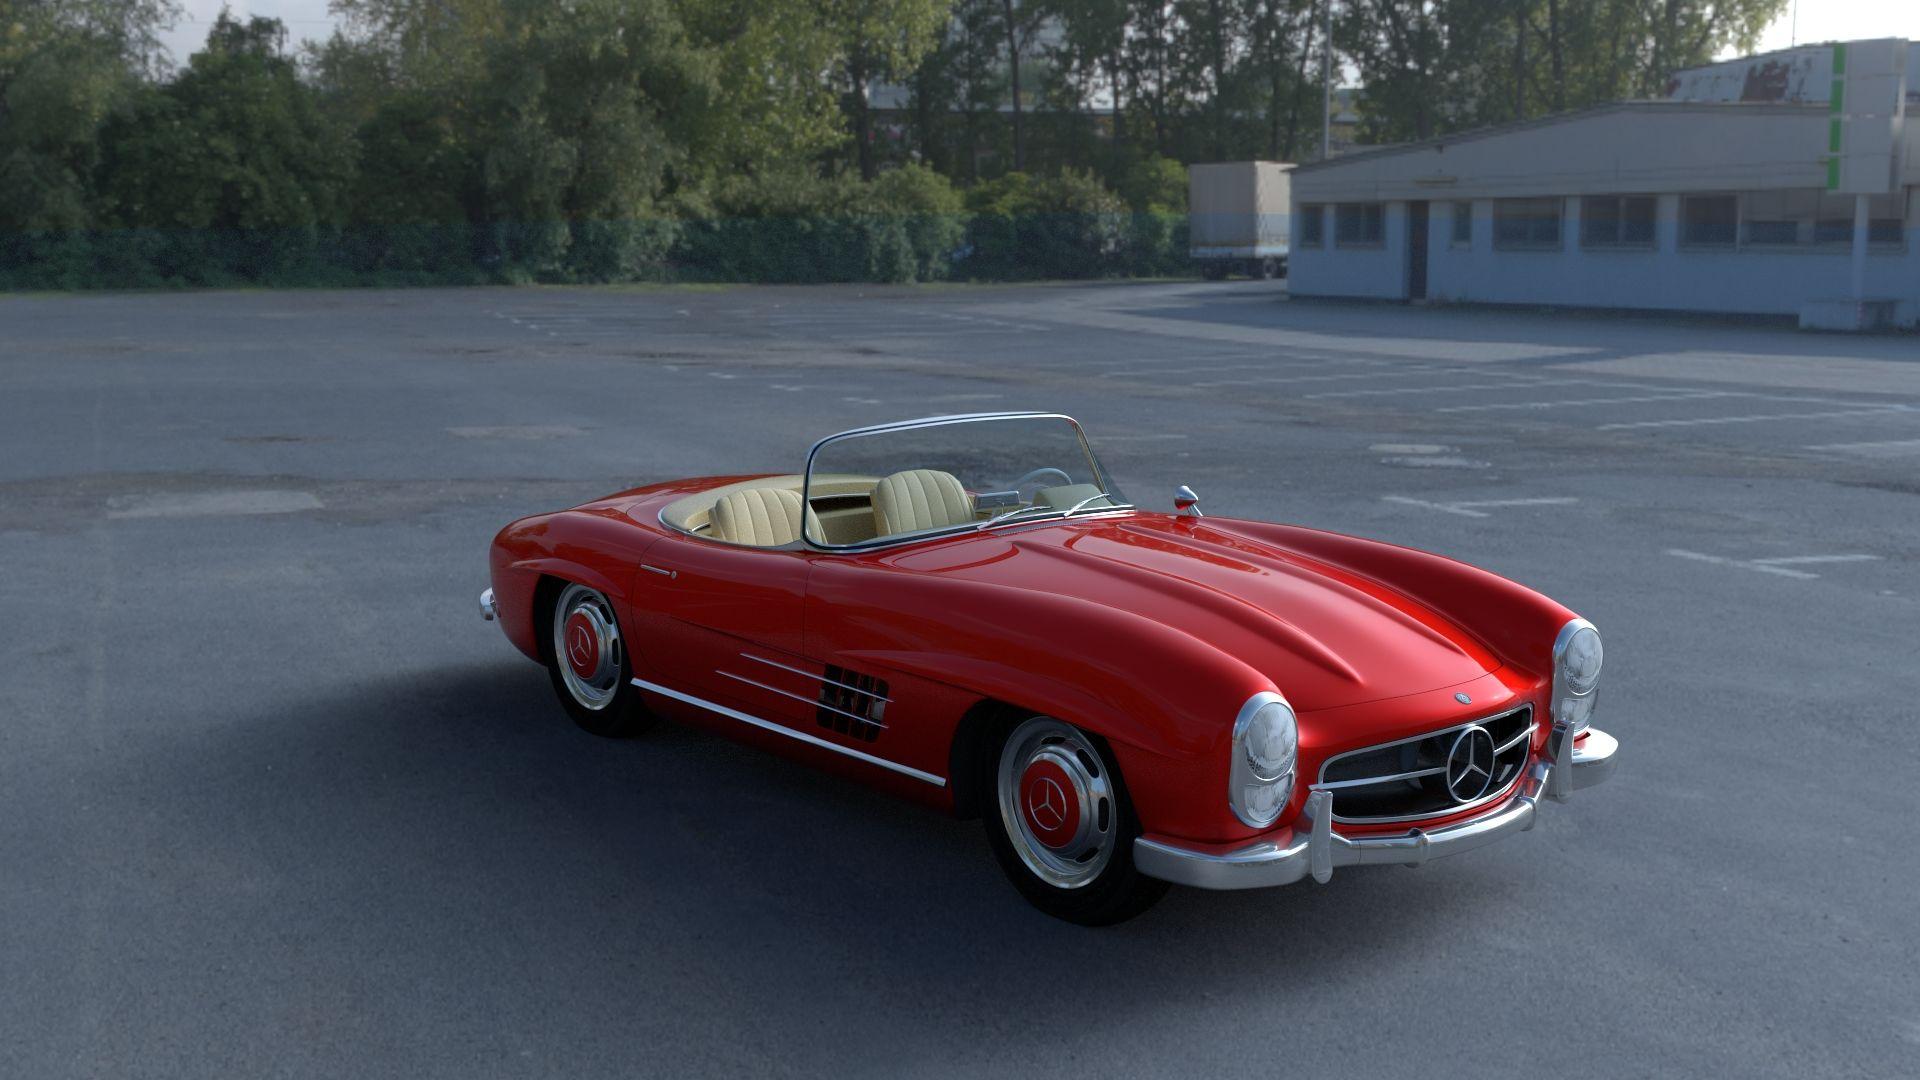 Fully Modelled Mercedes 300sl Roadster Red Hdri Mercedes 300sl